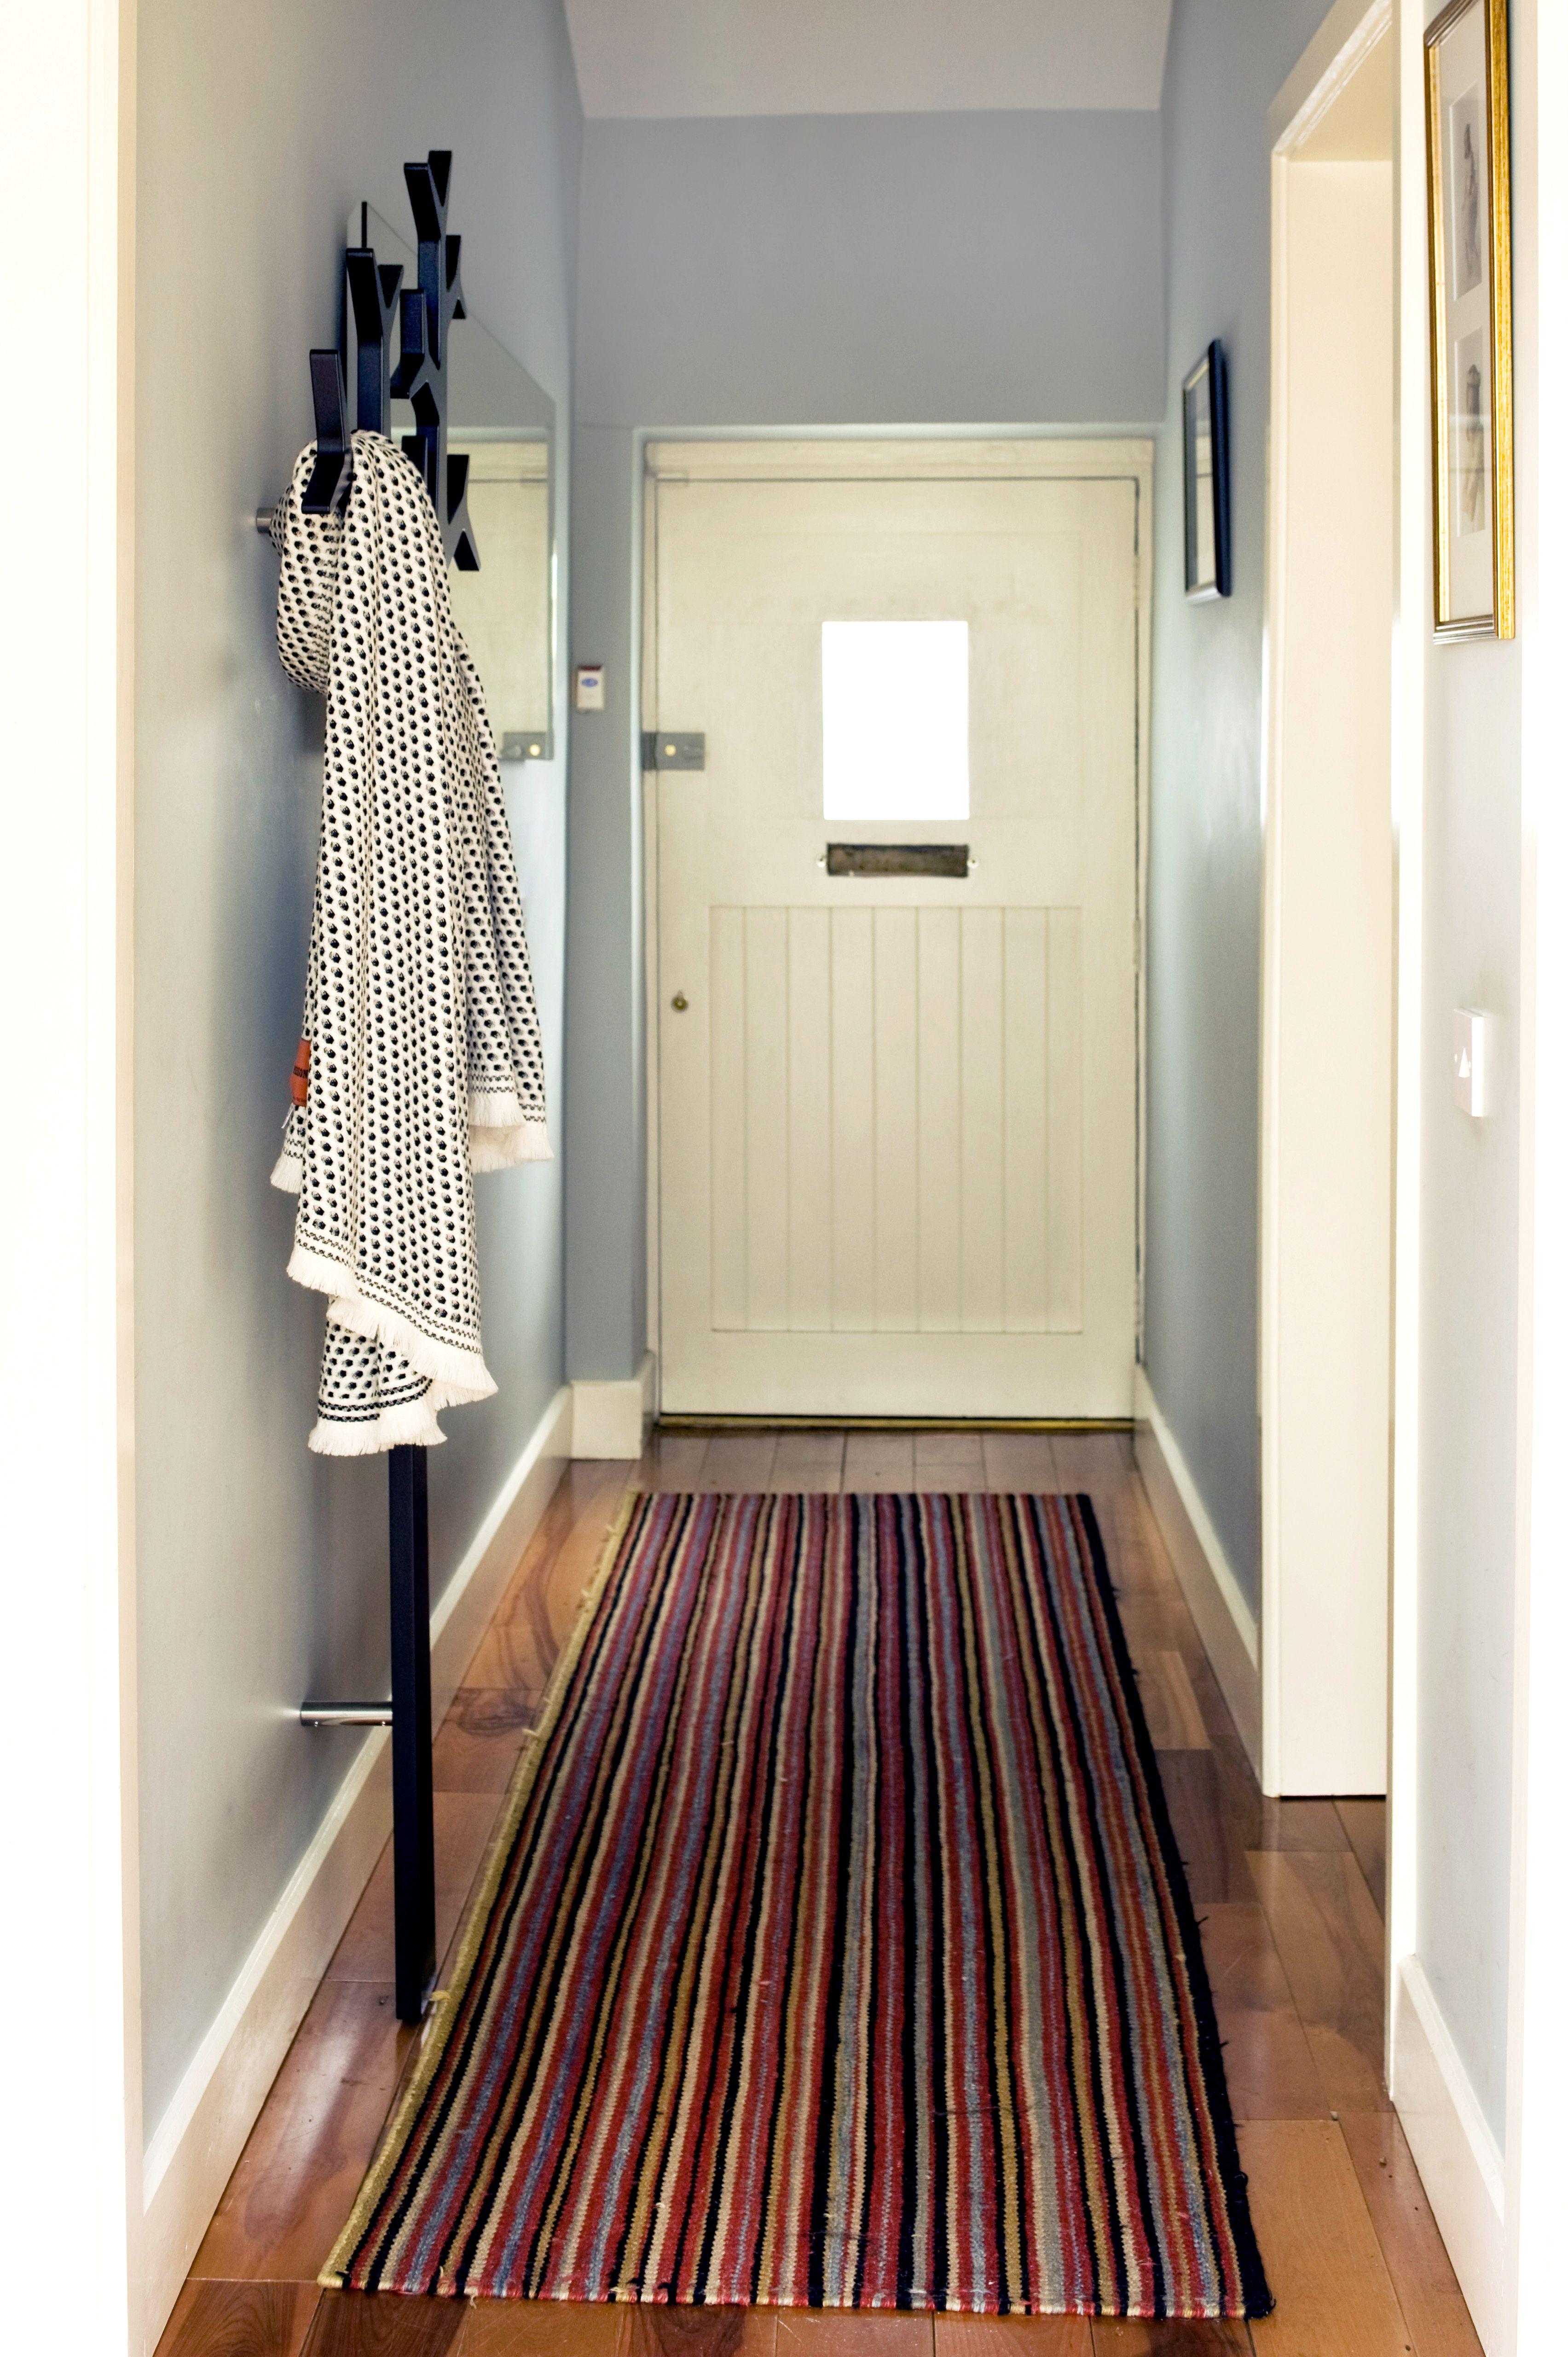 Residential entrance hallway carpet runner soft blue tree coast hanger cottage - Coat rack for small spaces design ...